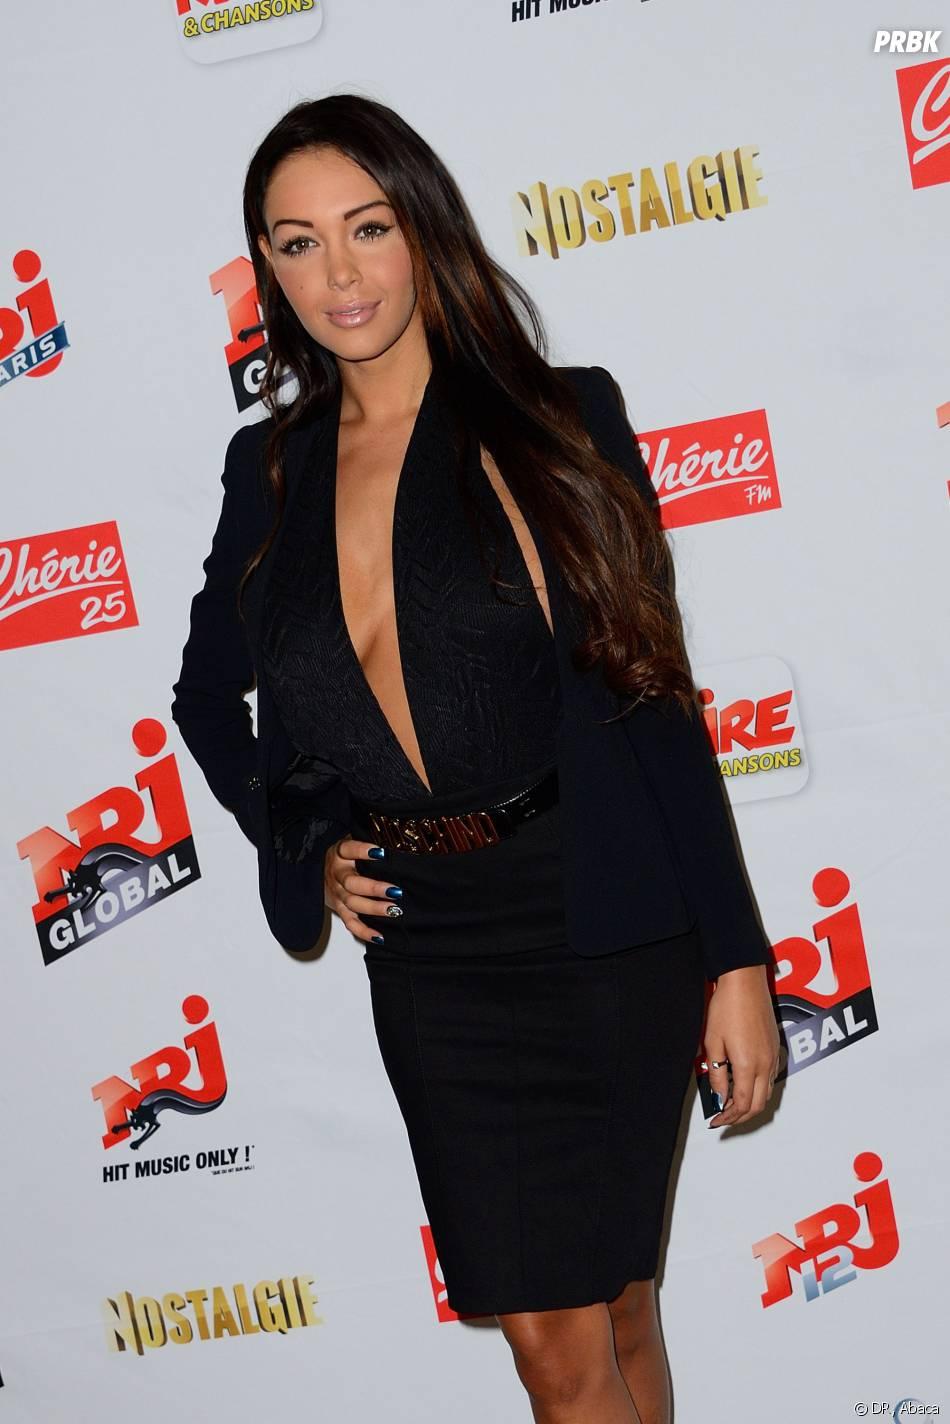 Nabilla Benattia confirme ne pas avoir porté de culotte sur Canal +